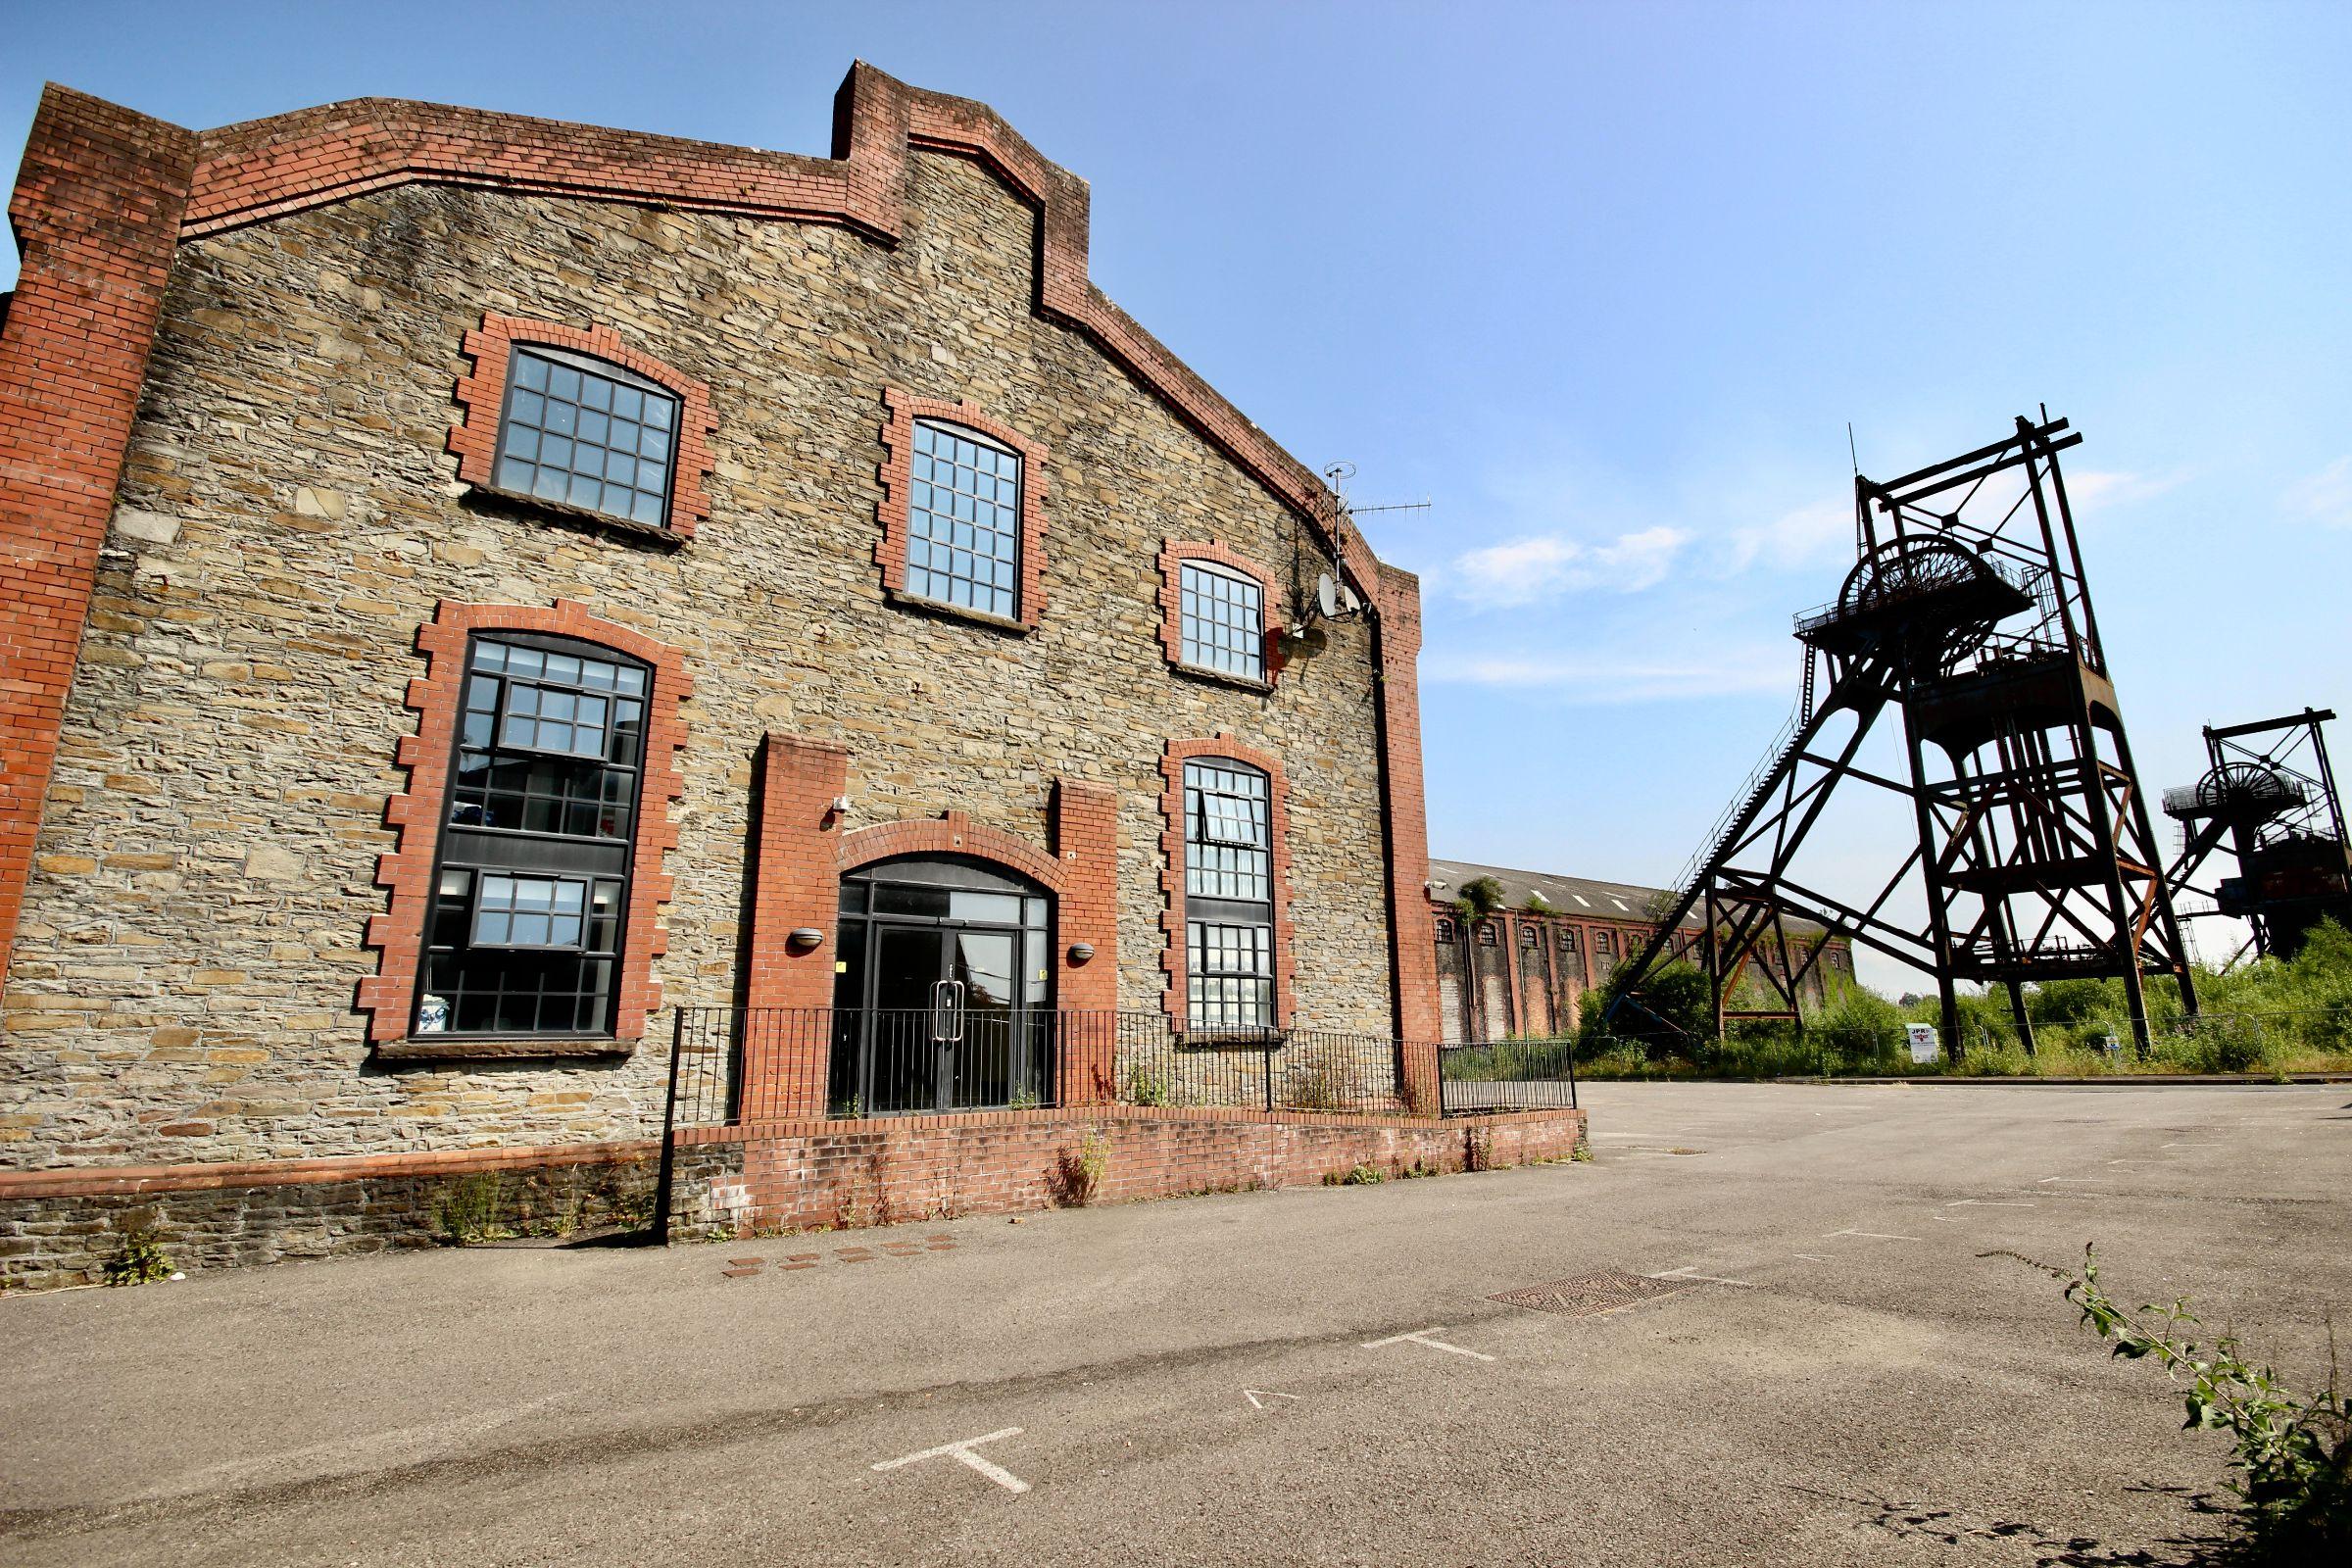 The Great Engineering Building, Winding Wheel Lane, Penallta, Hengoed